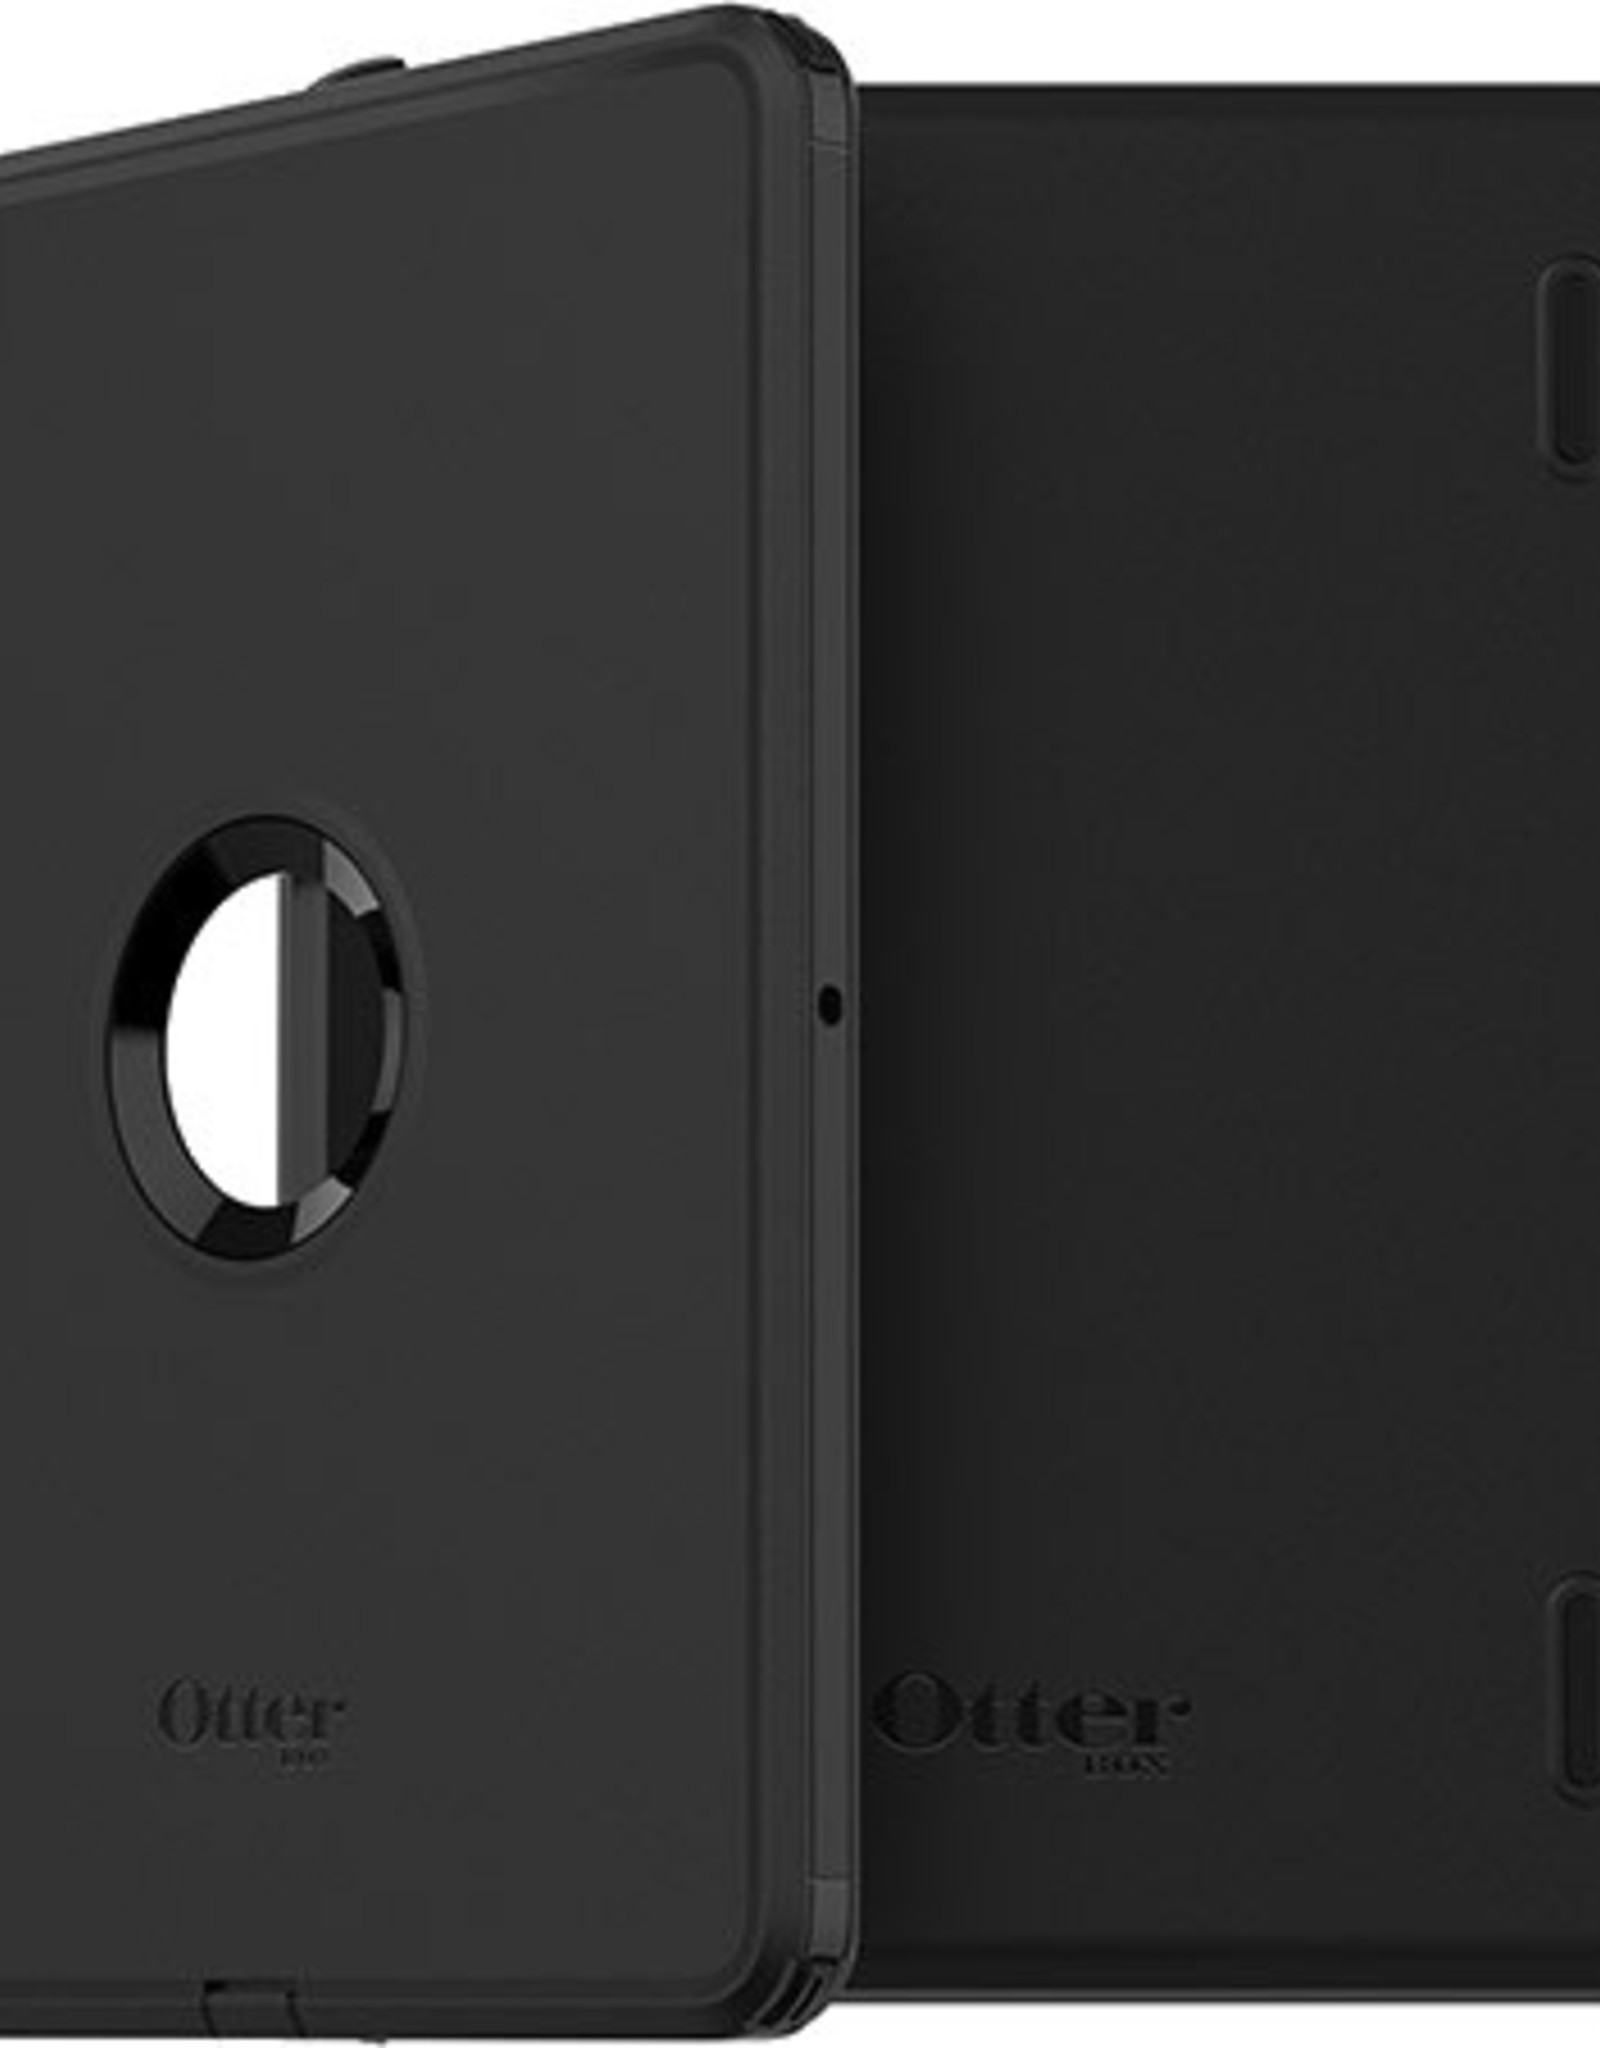 Otterbox Otterbox   iPad Pro 12.9 (2020/2019/2018) Black Defender Series Case 120-3085